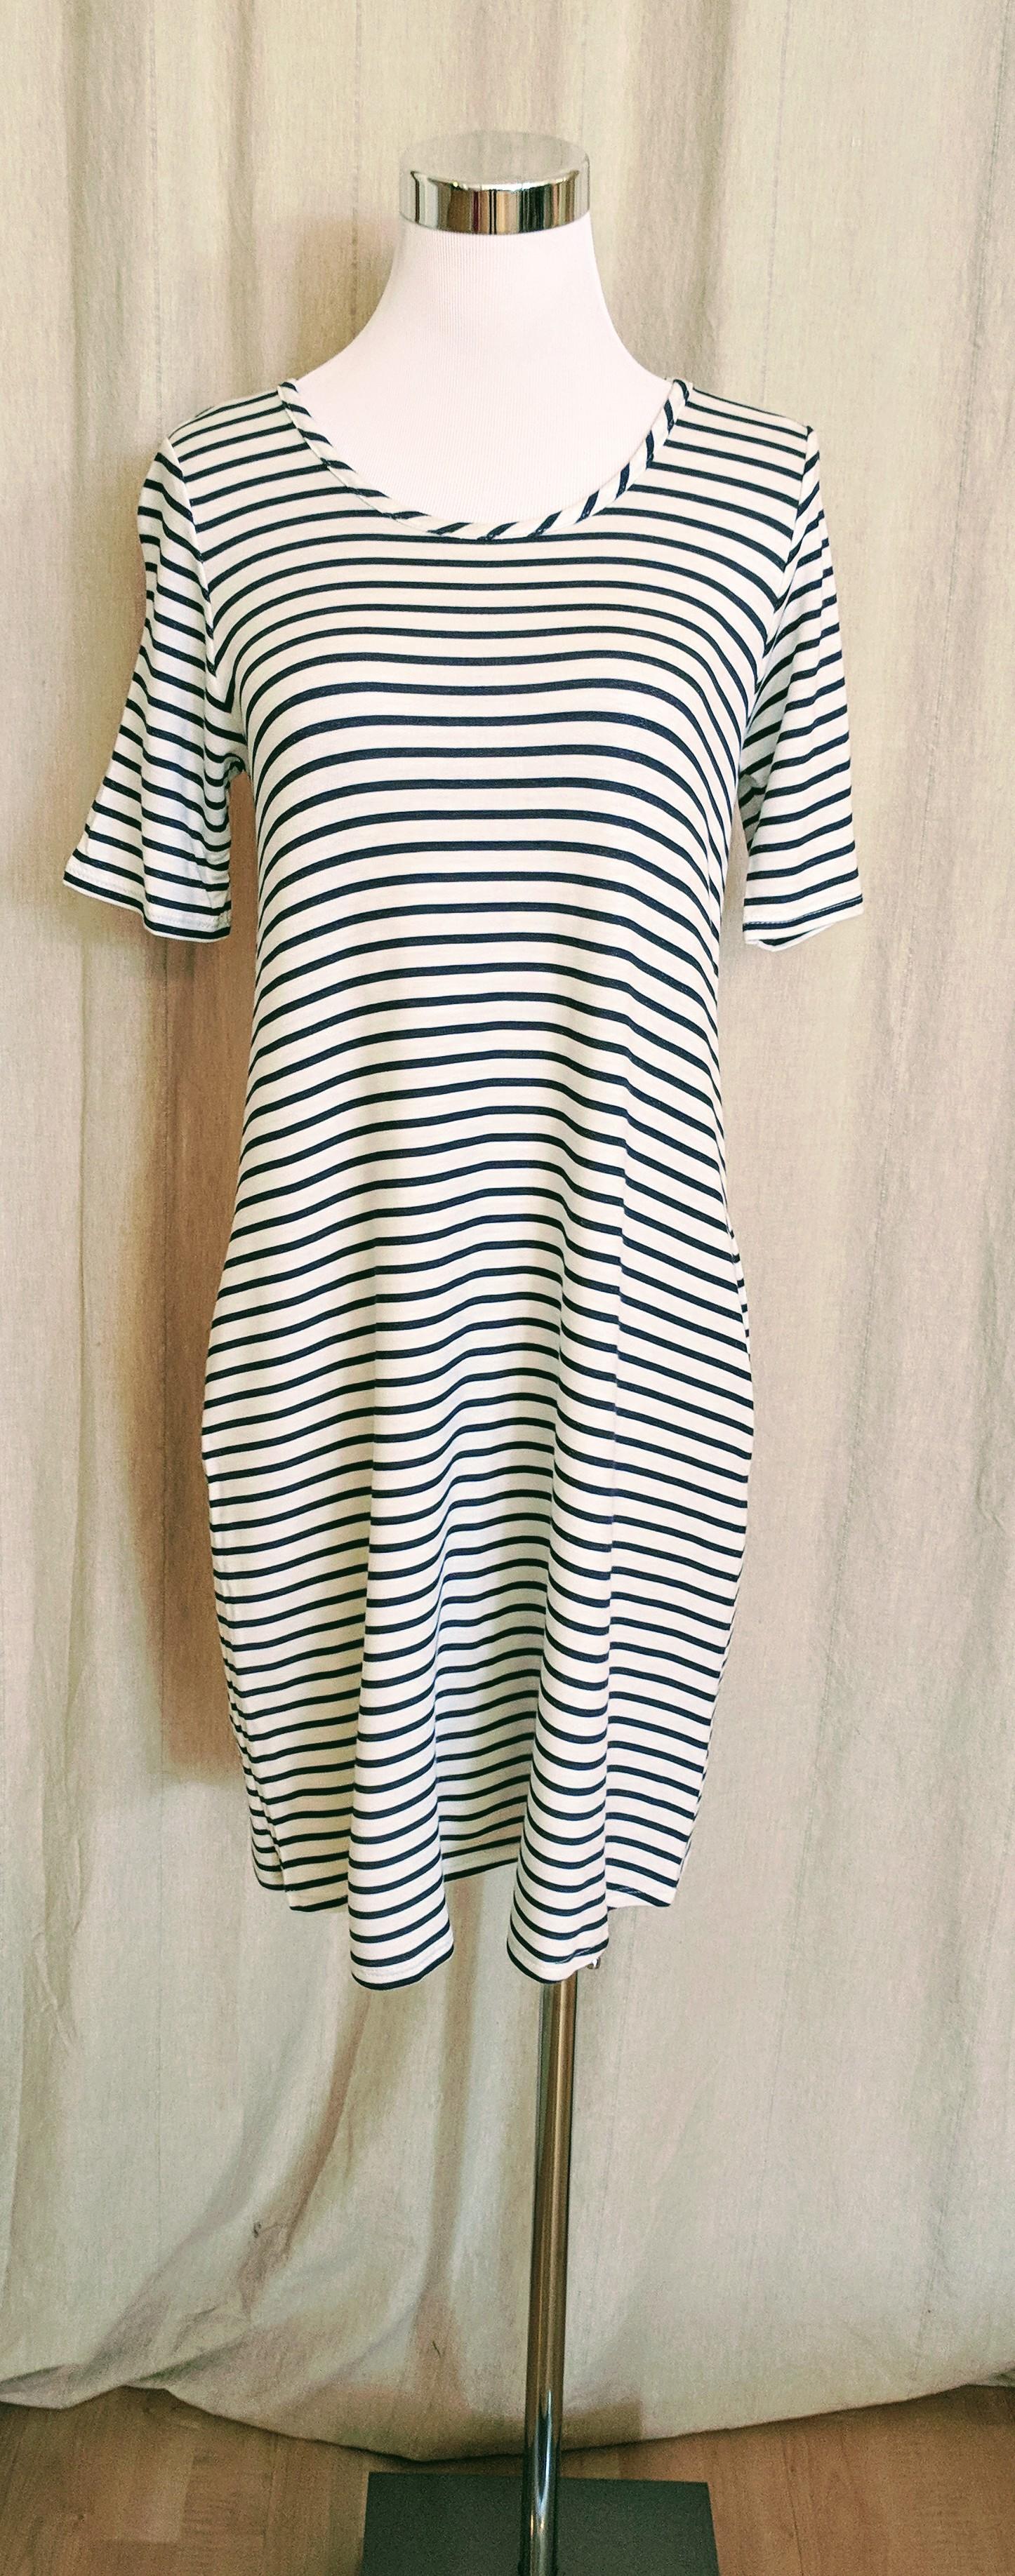 Navy stripe tunic dress with key hole detail on back. $38